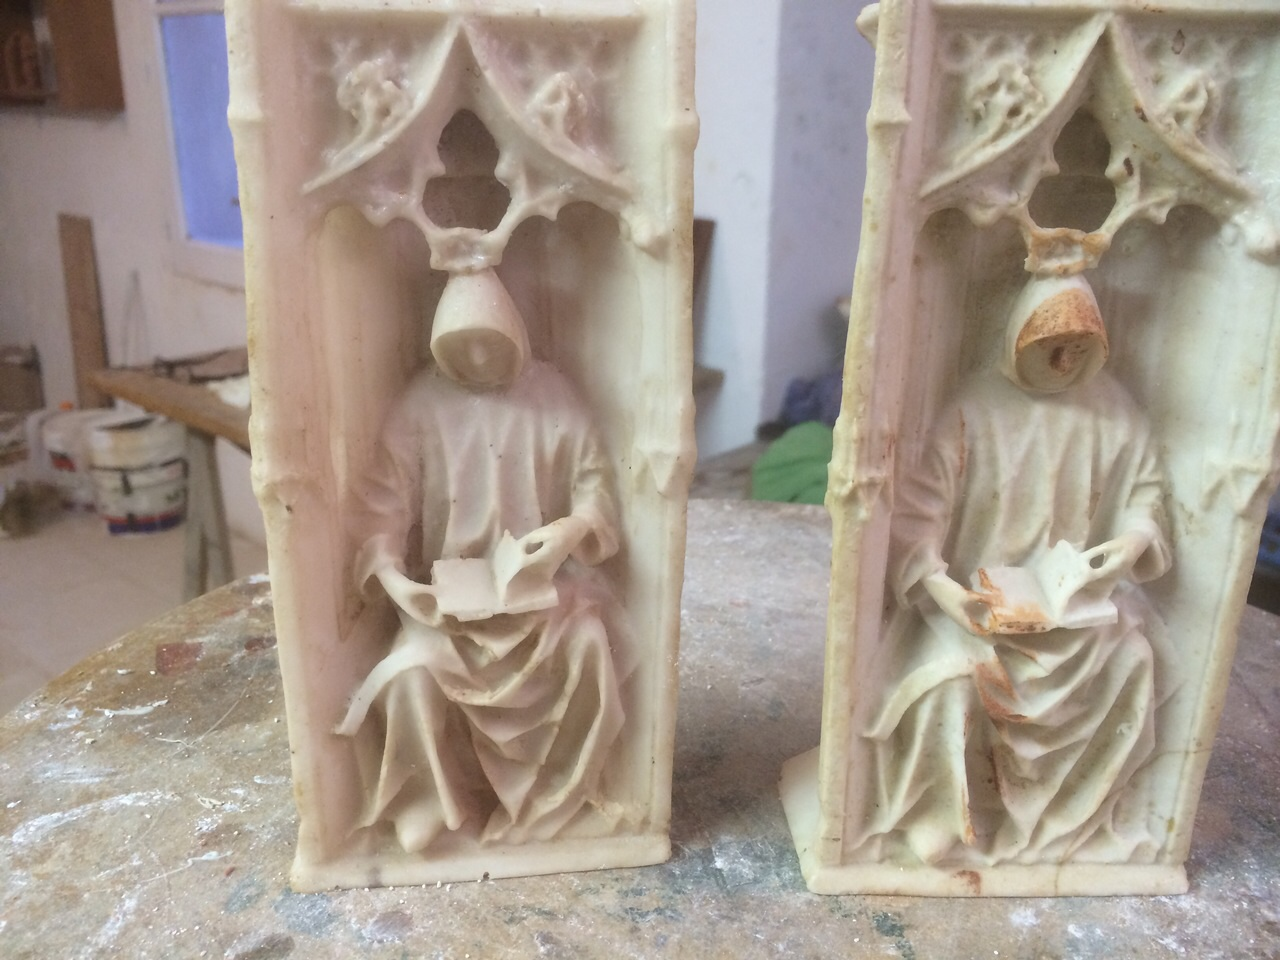 Figuras en resina la Cartuja de Miraflores